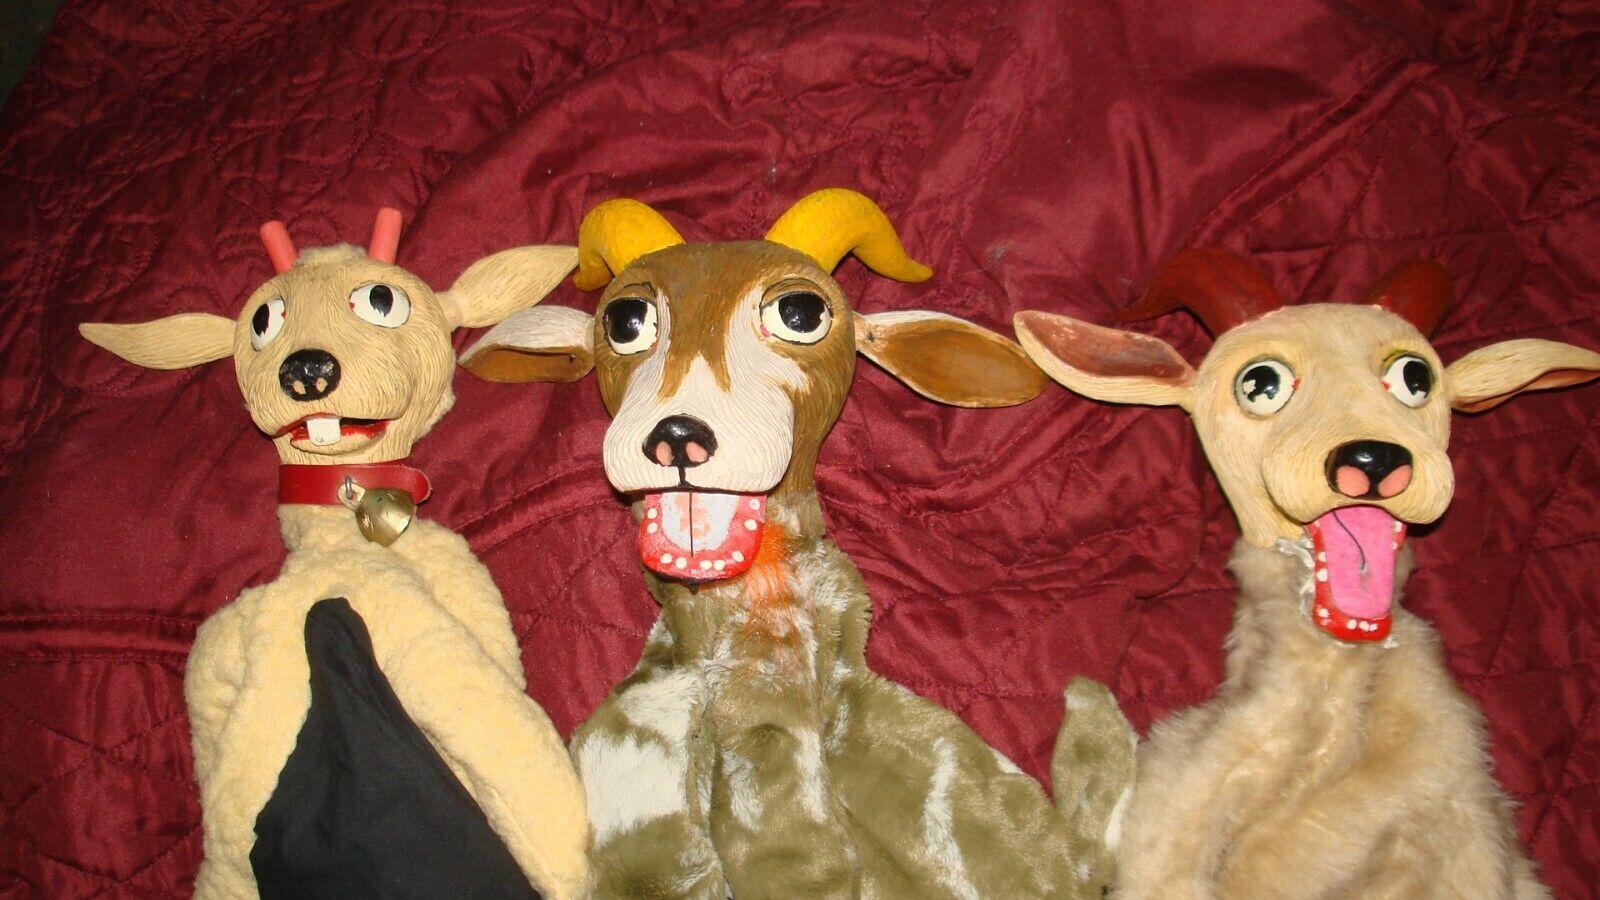 si affrettò a vedere Paul's Puppets Lot of Three Billy Goats Gruff Gruff Gruff He Puppets '50s Baltimore T.V.  economico